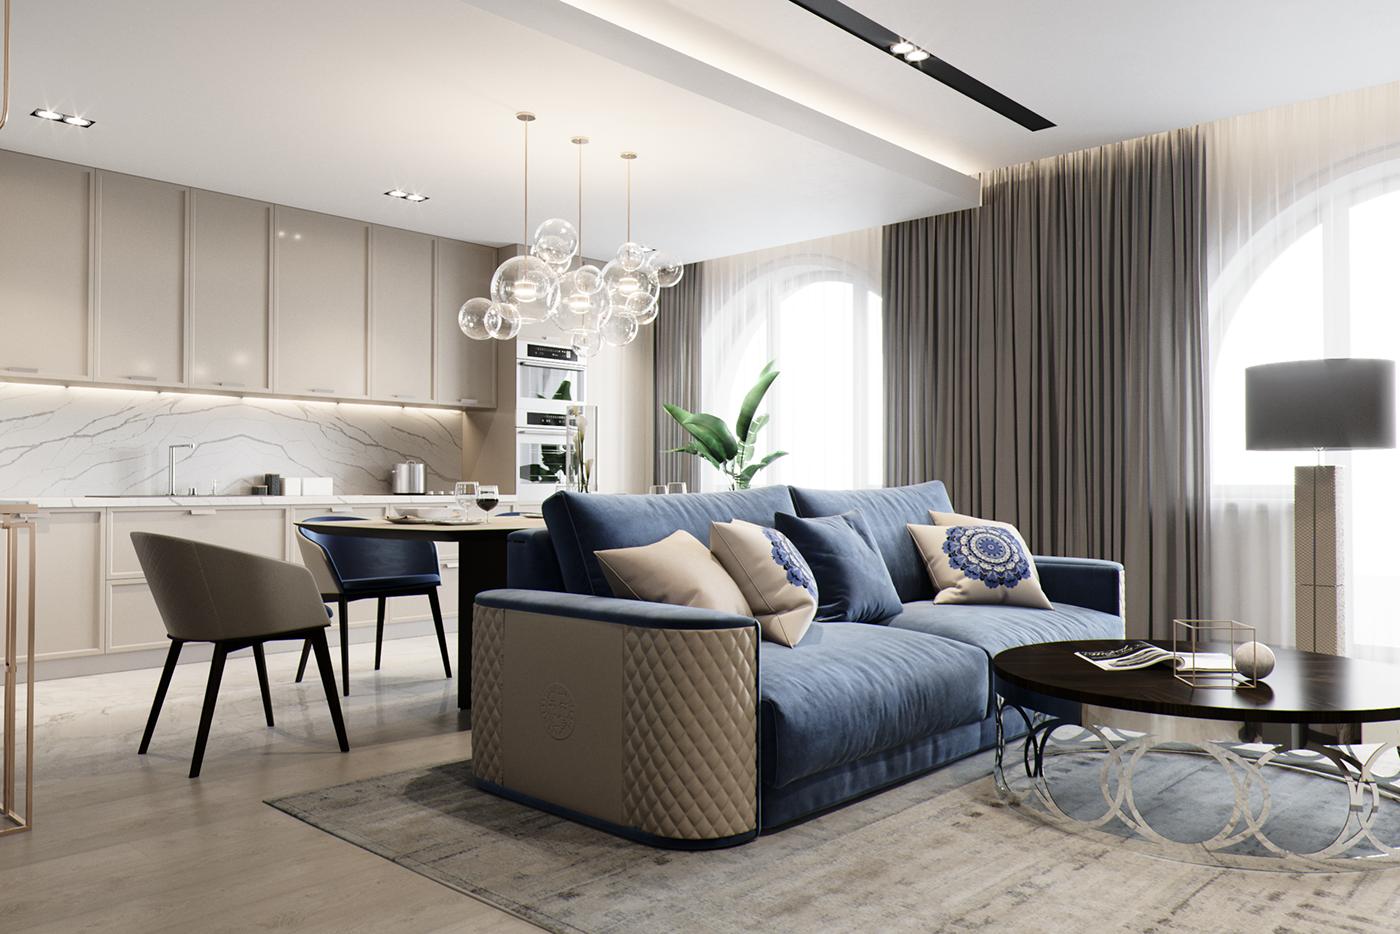 Luxury living apartments. Design for INEX Studio on Behance